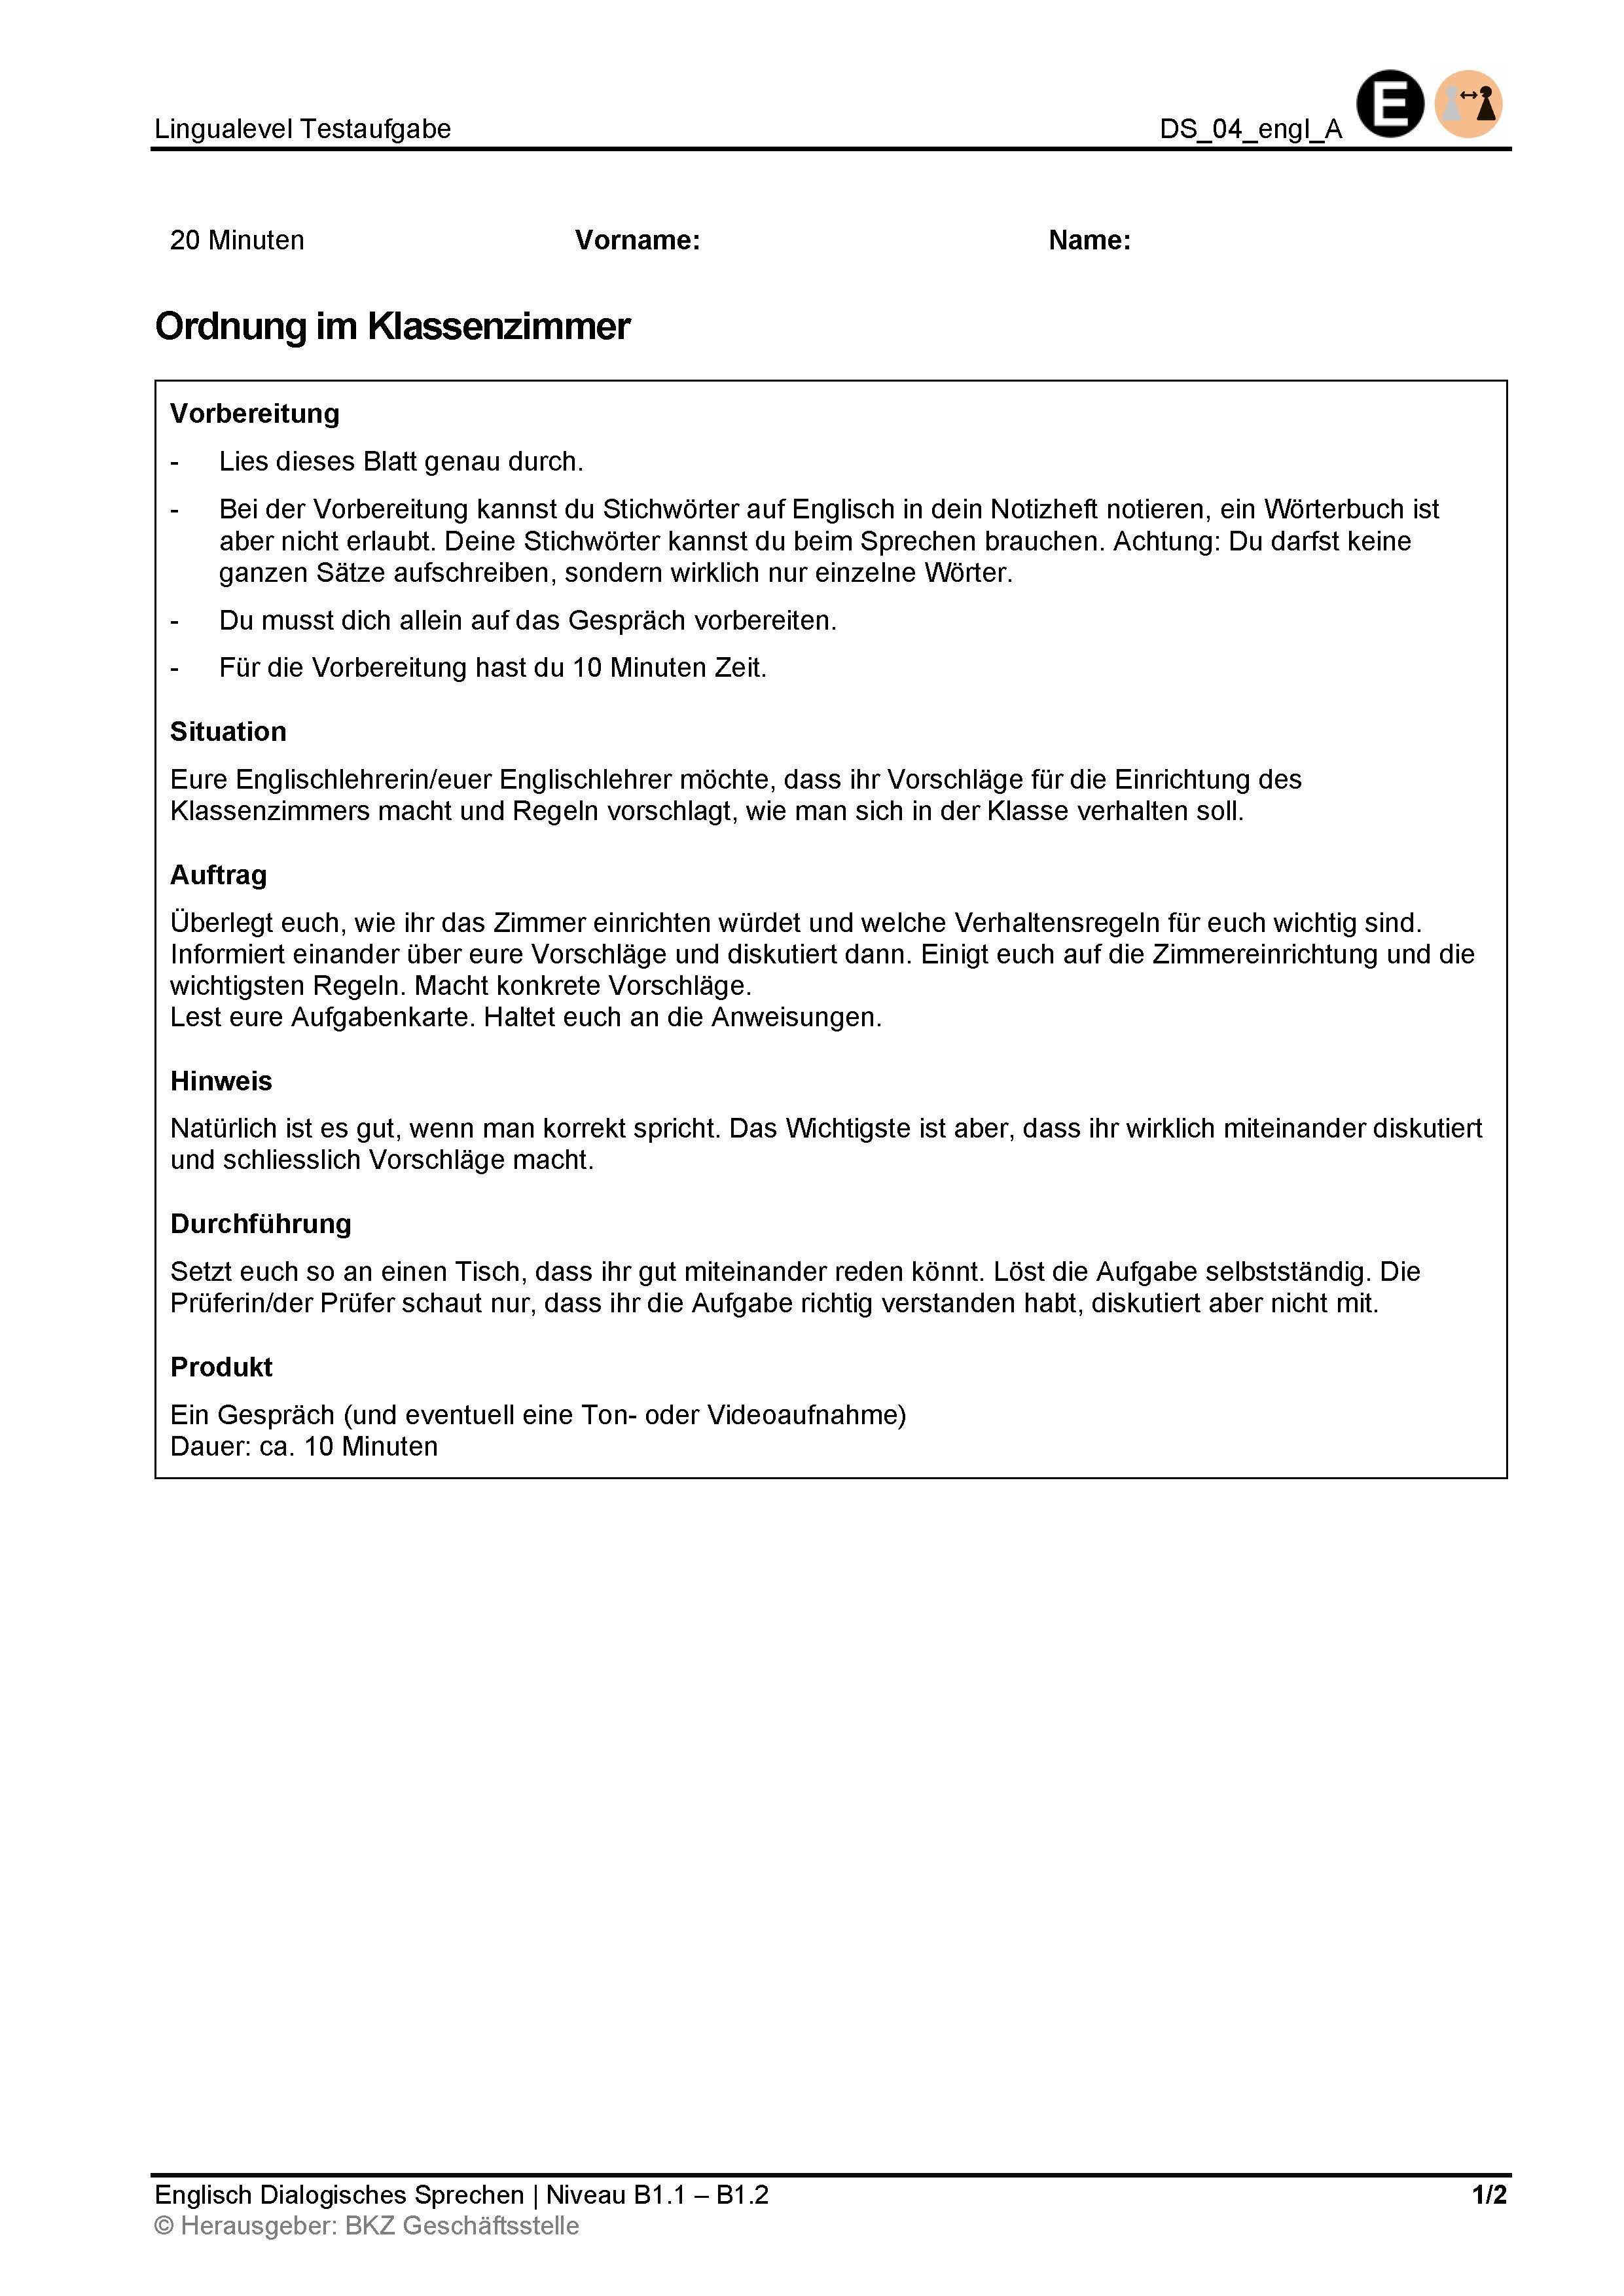 Preview image for LOM object Dialogisches Sprechen: Ordnung im Klassenzimmer